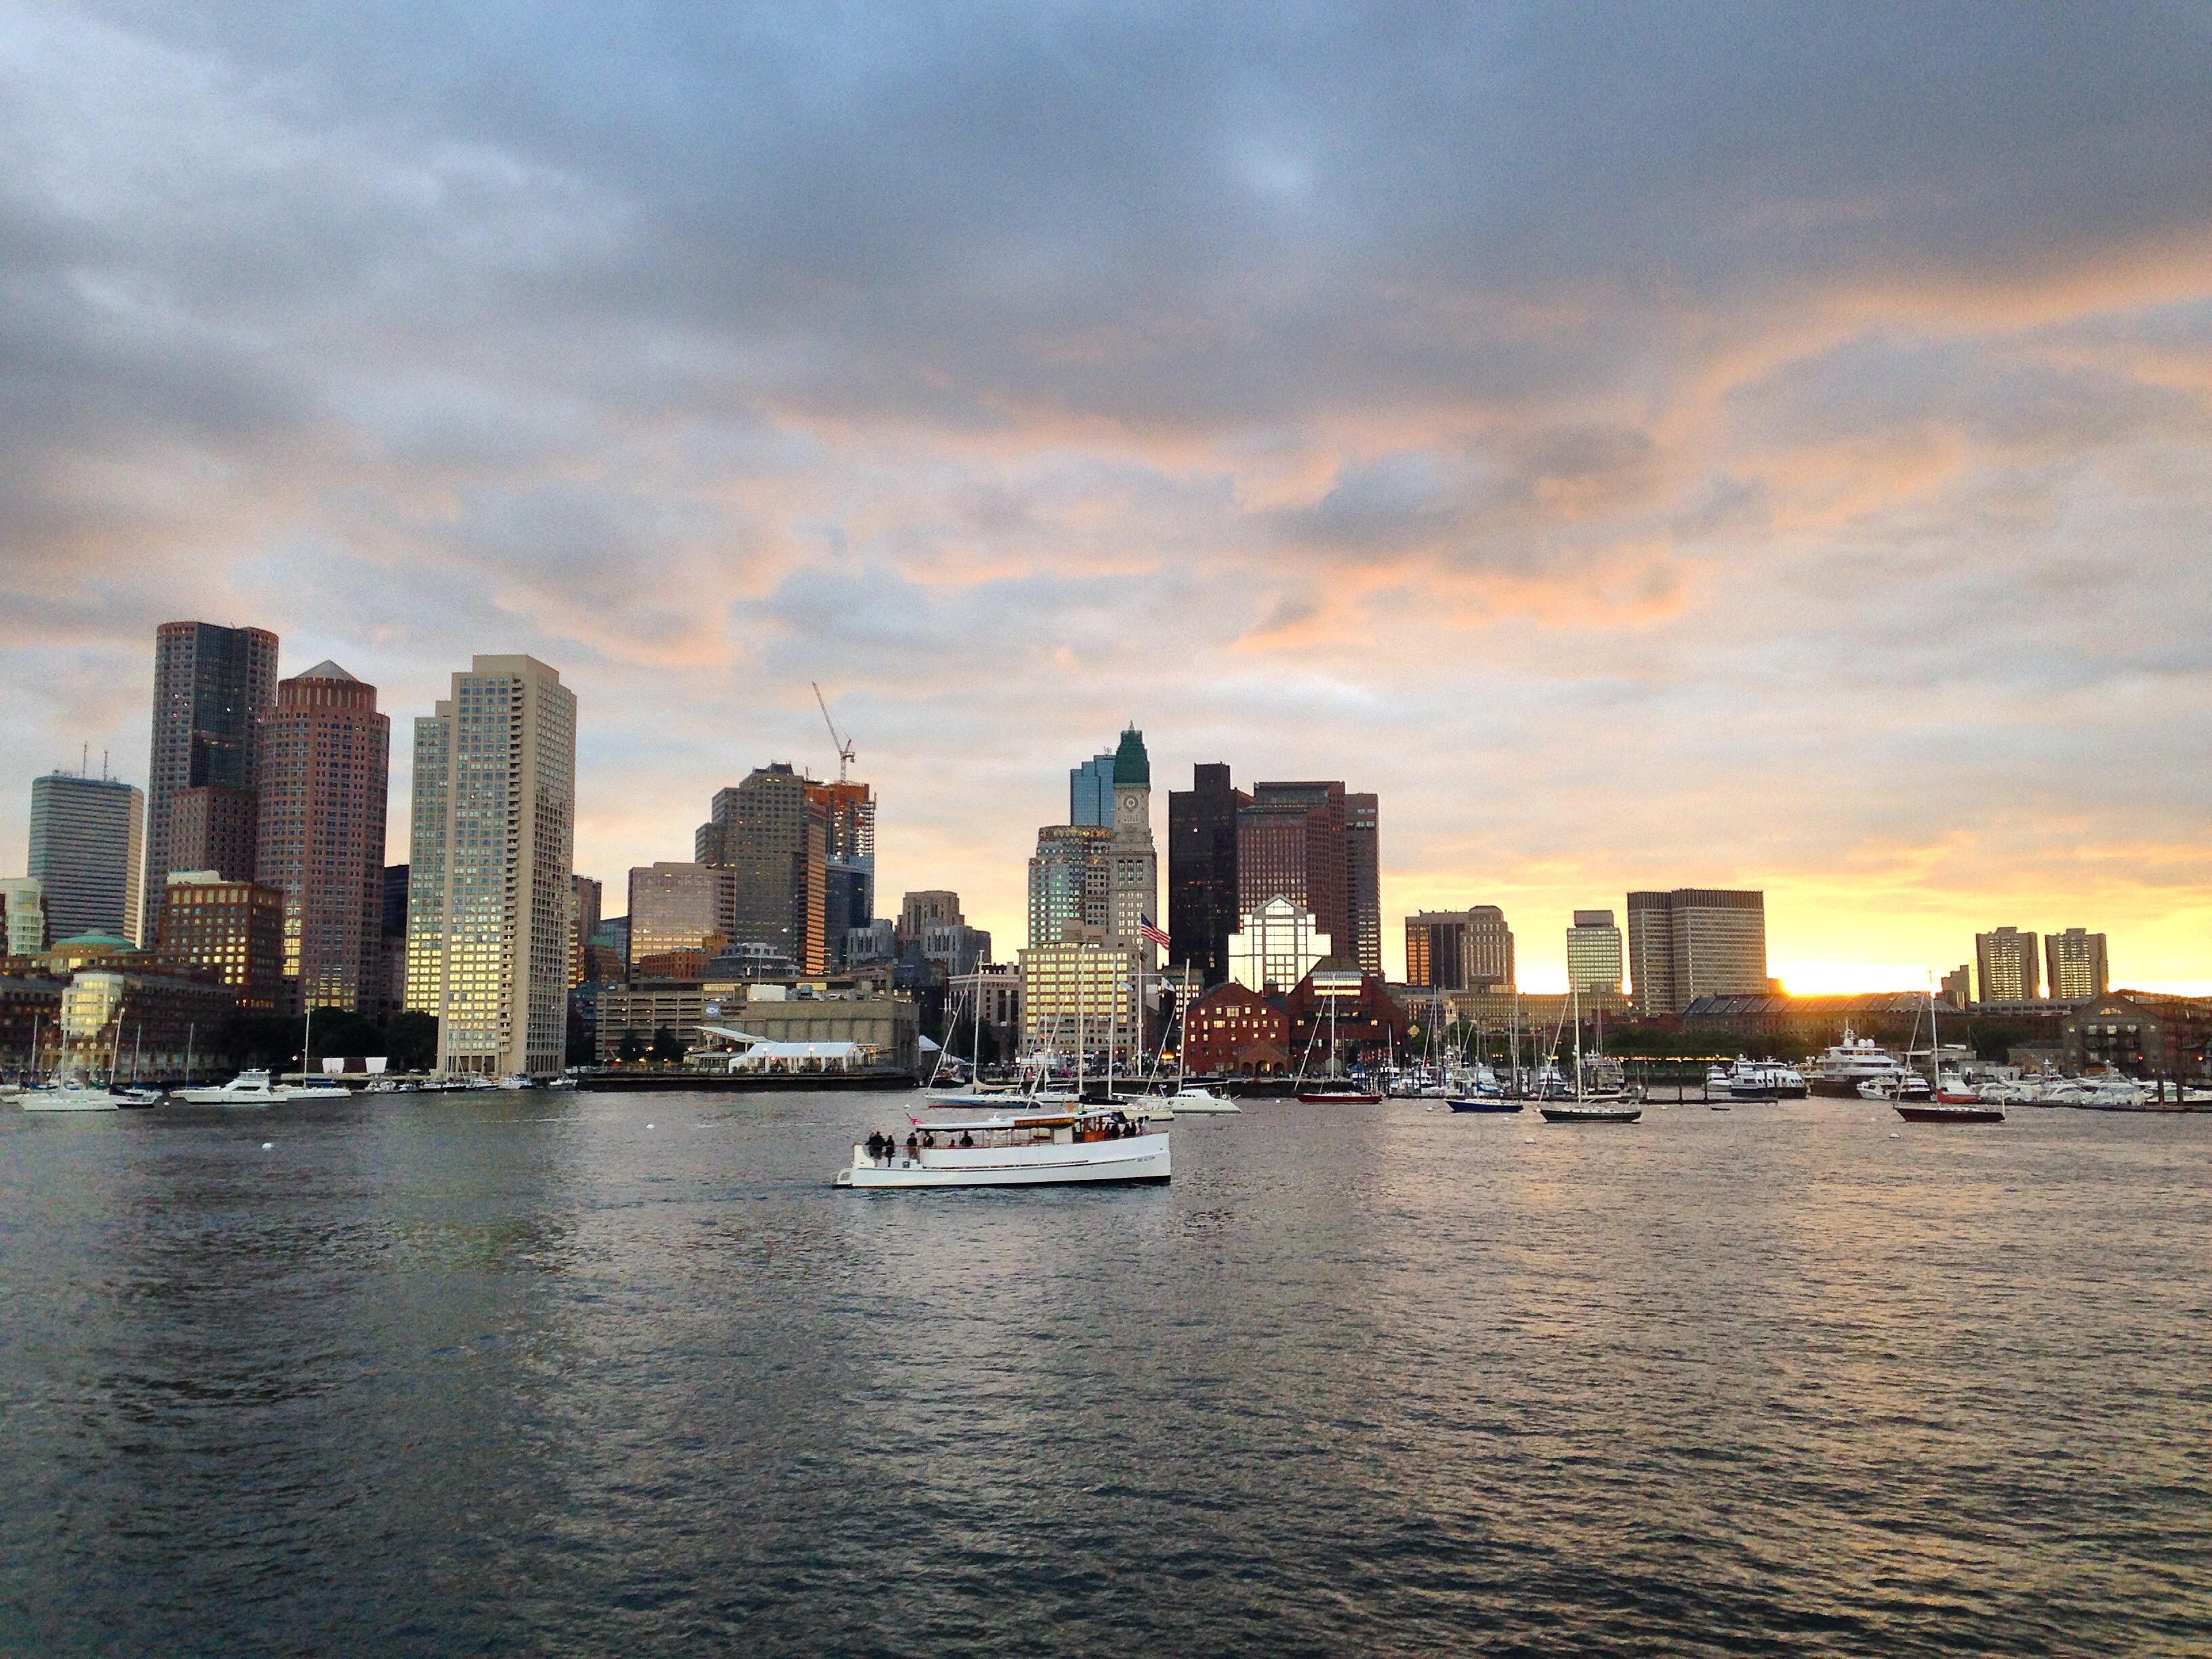 City Spotlight on Boston, USA